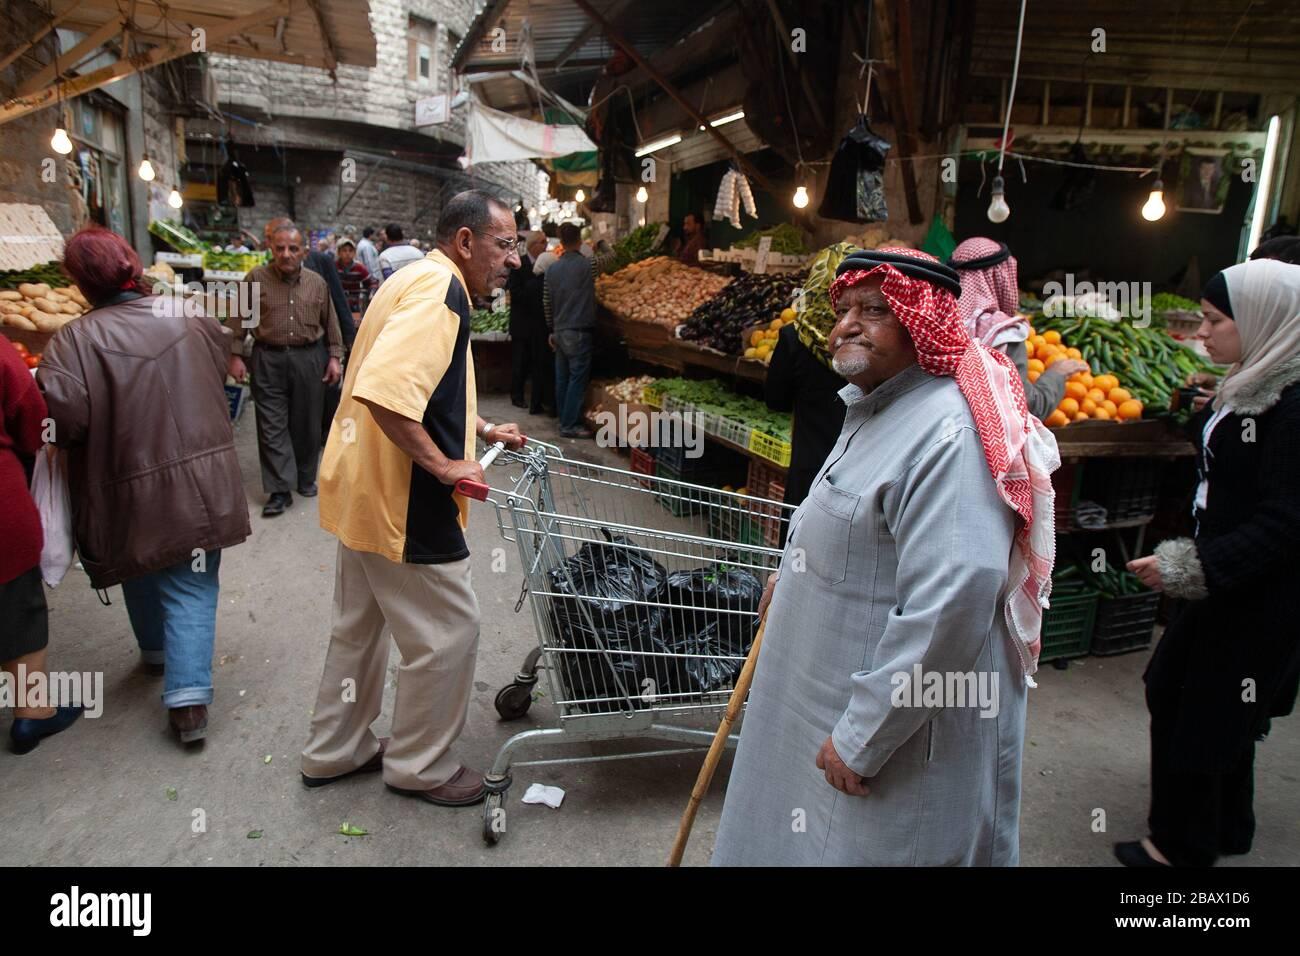 Amman, Jordan, May 3, 2009: A busy street market in dowtown Amman, Jordan. Stock Photo